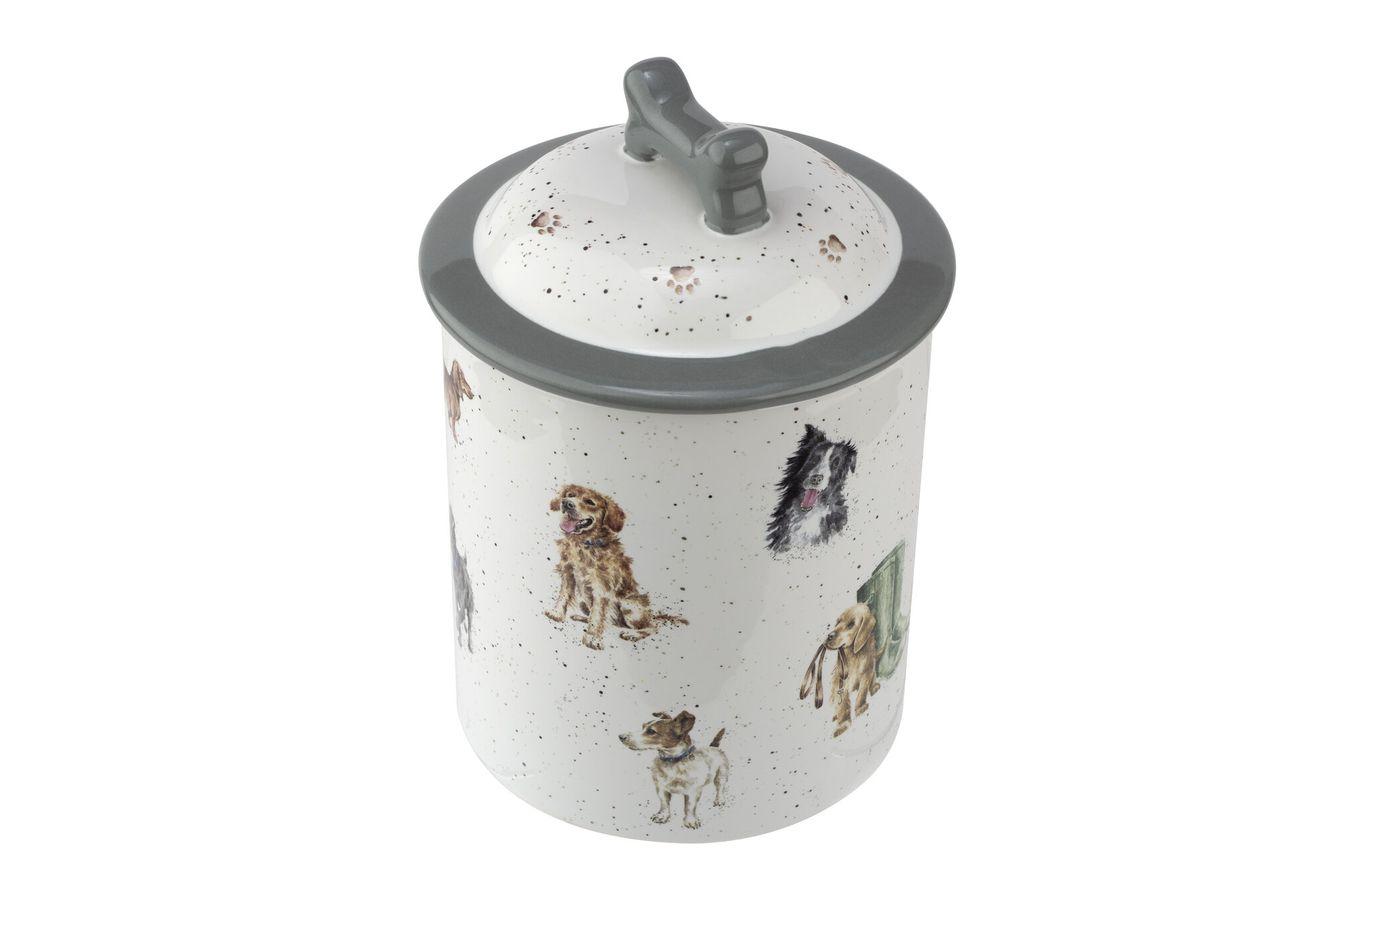 Royal Worcester Wrendale Designs Dog Treat Jar 19cm thumb 2